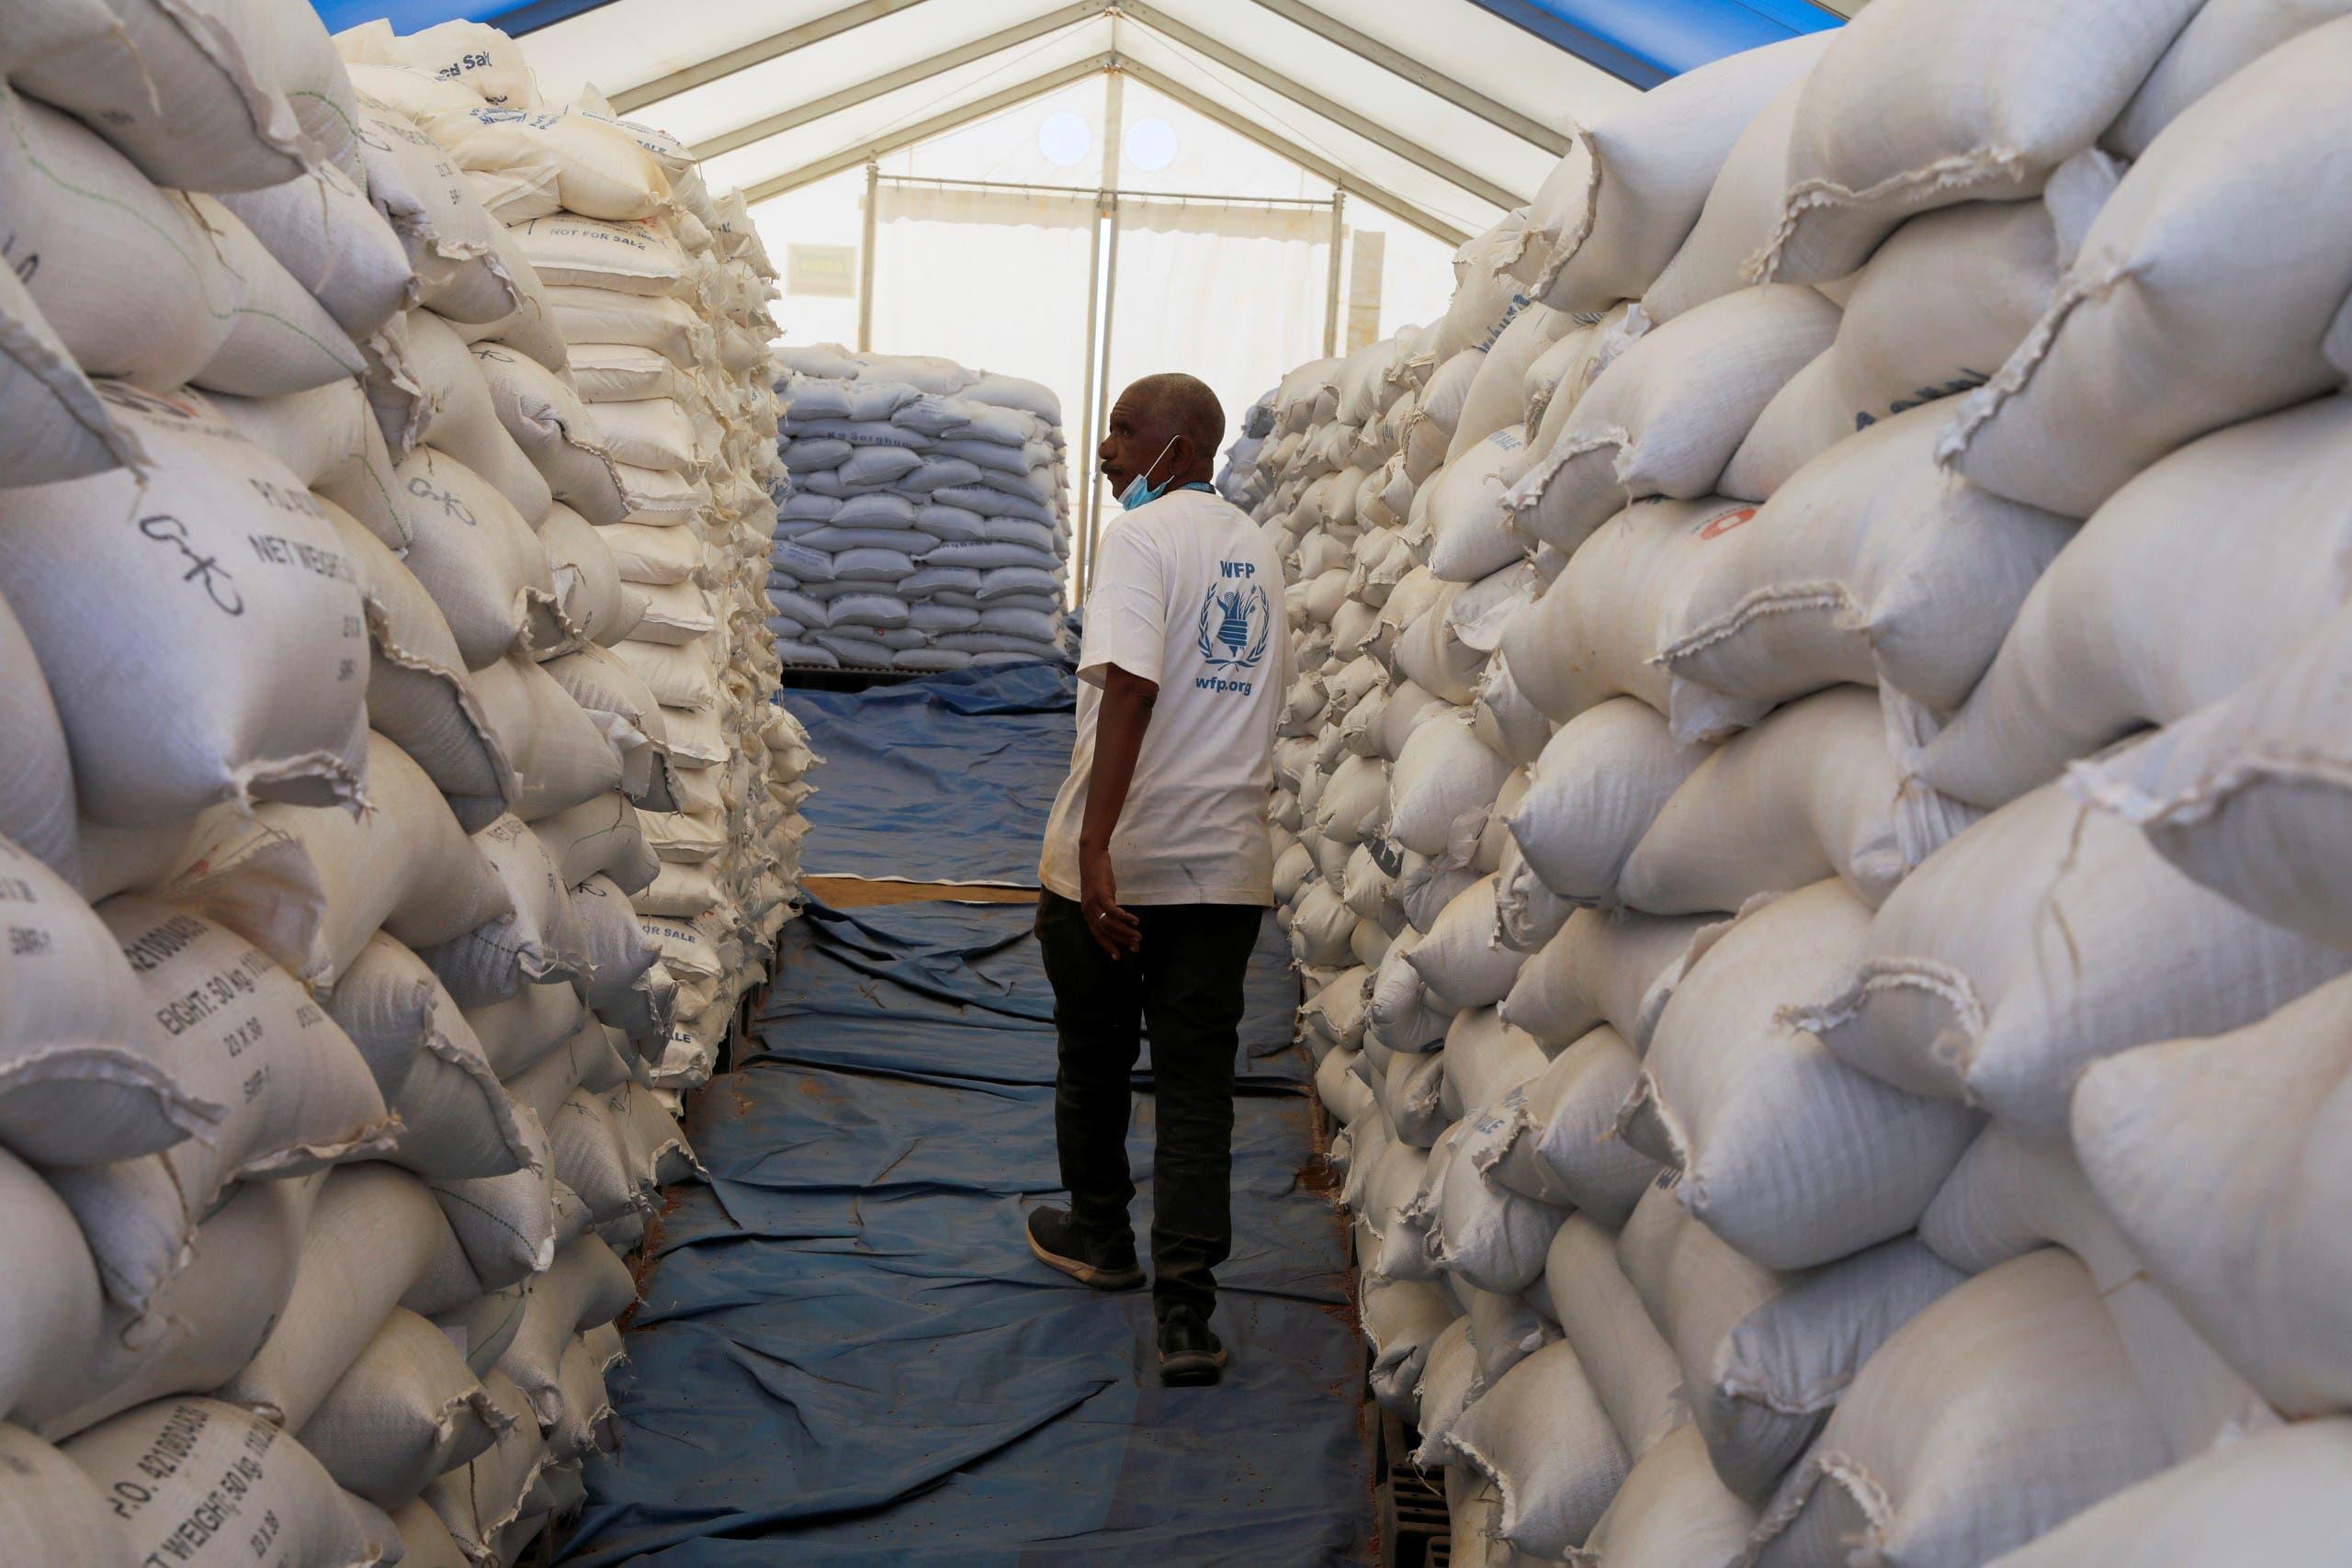 World Food Programme employee walks between sacks of food at the Um Rakuba refugee camp which houses Ethiopian refugees fleeing the fighting in the Tigray region, on the Sudan-Ethiopia border in Sudan, November 29, 2020. (Reuters/Baz Ratner)